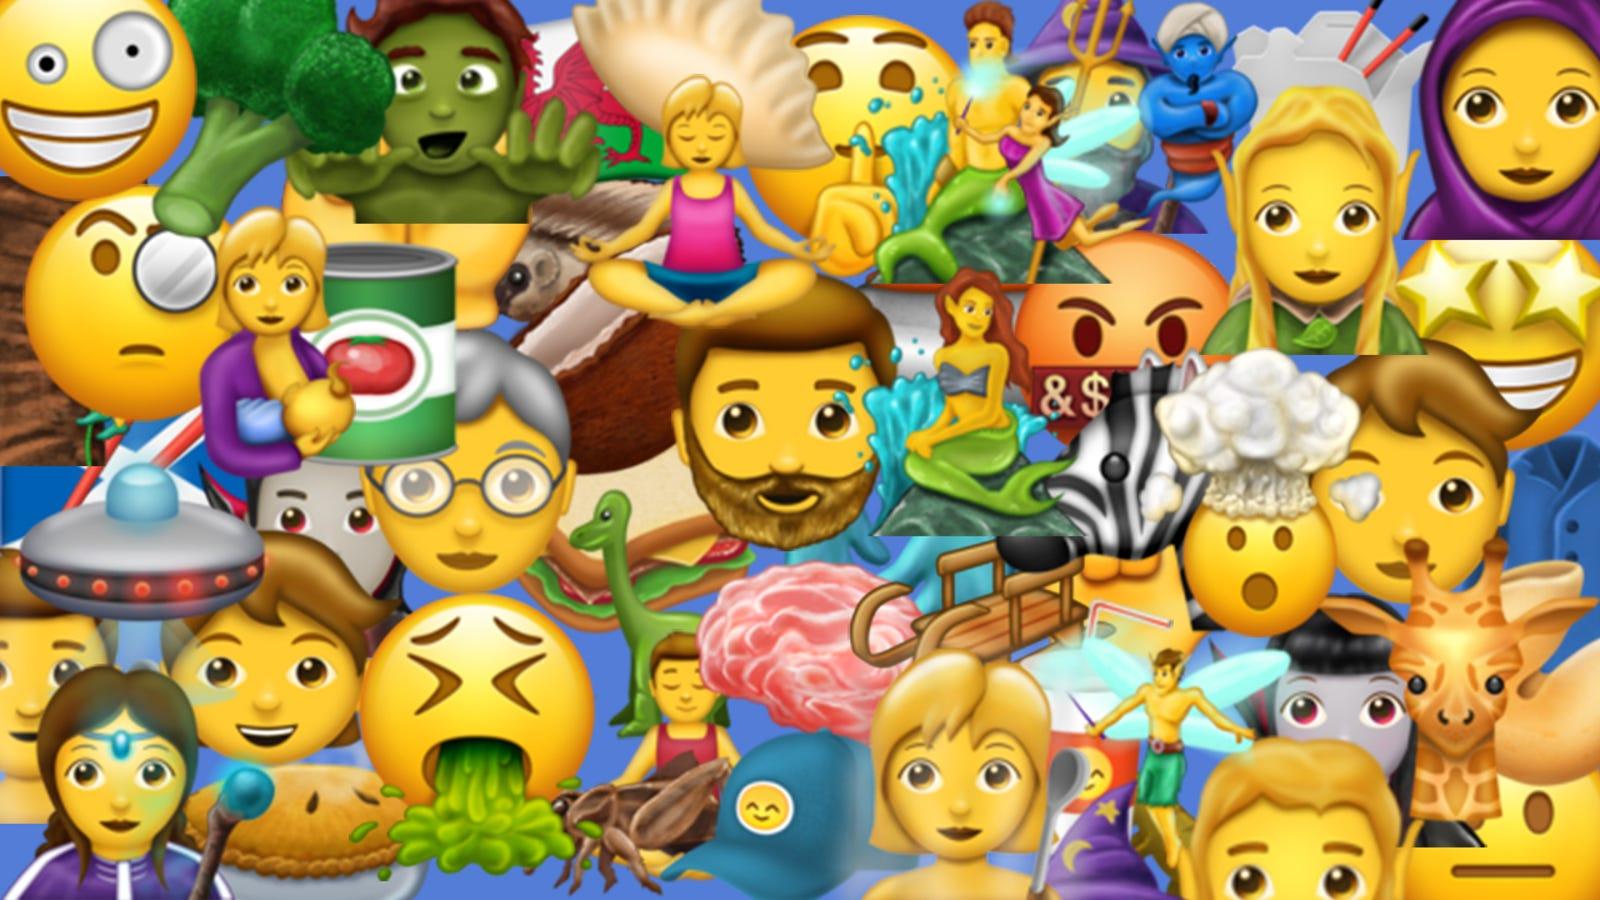 The 69 New Emoji Candidates, Ranked